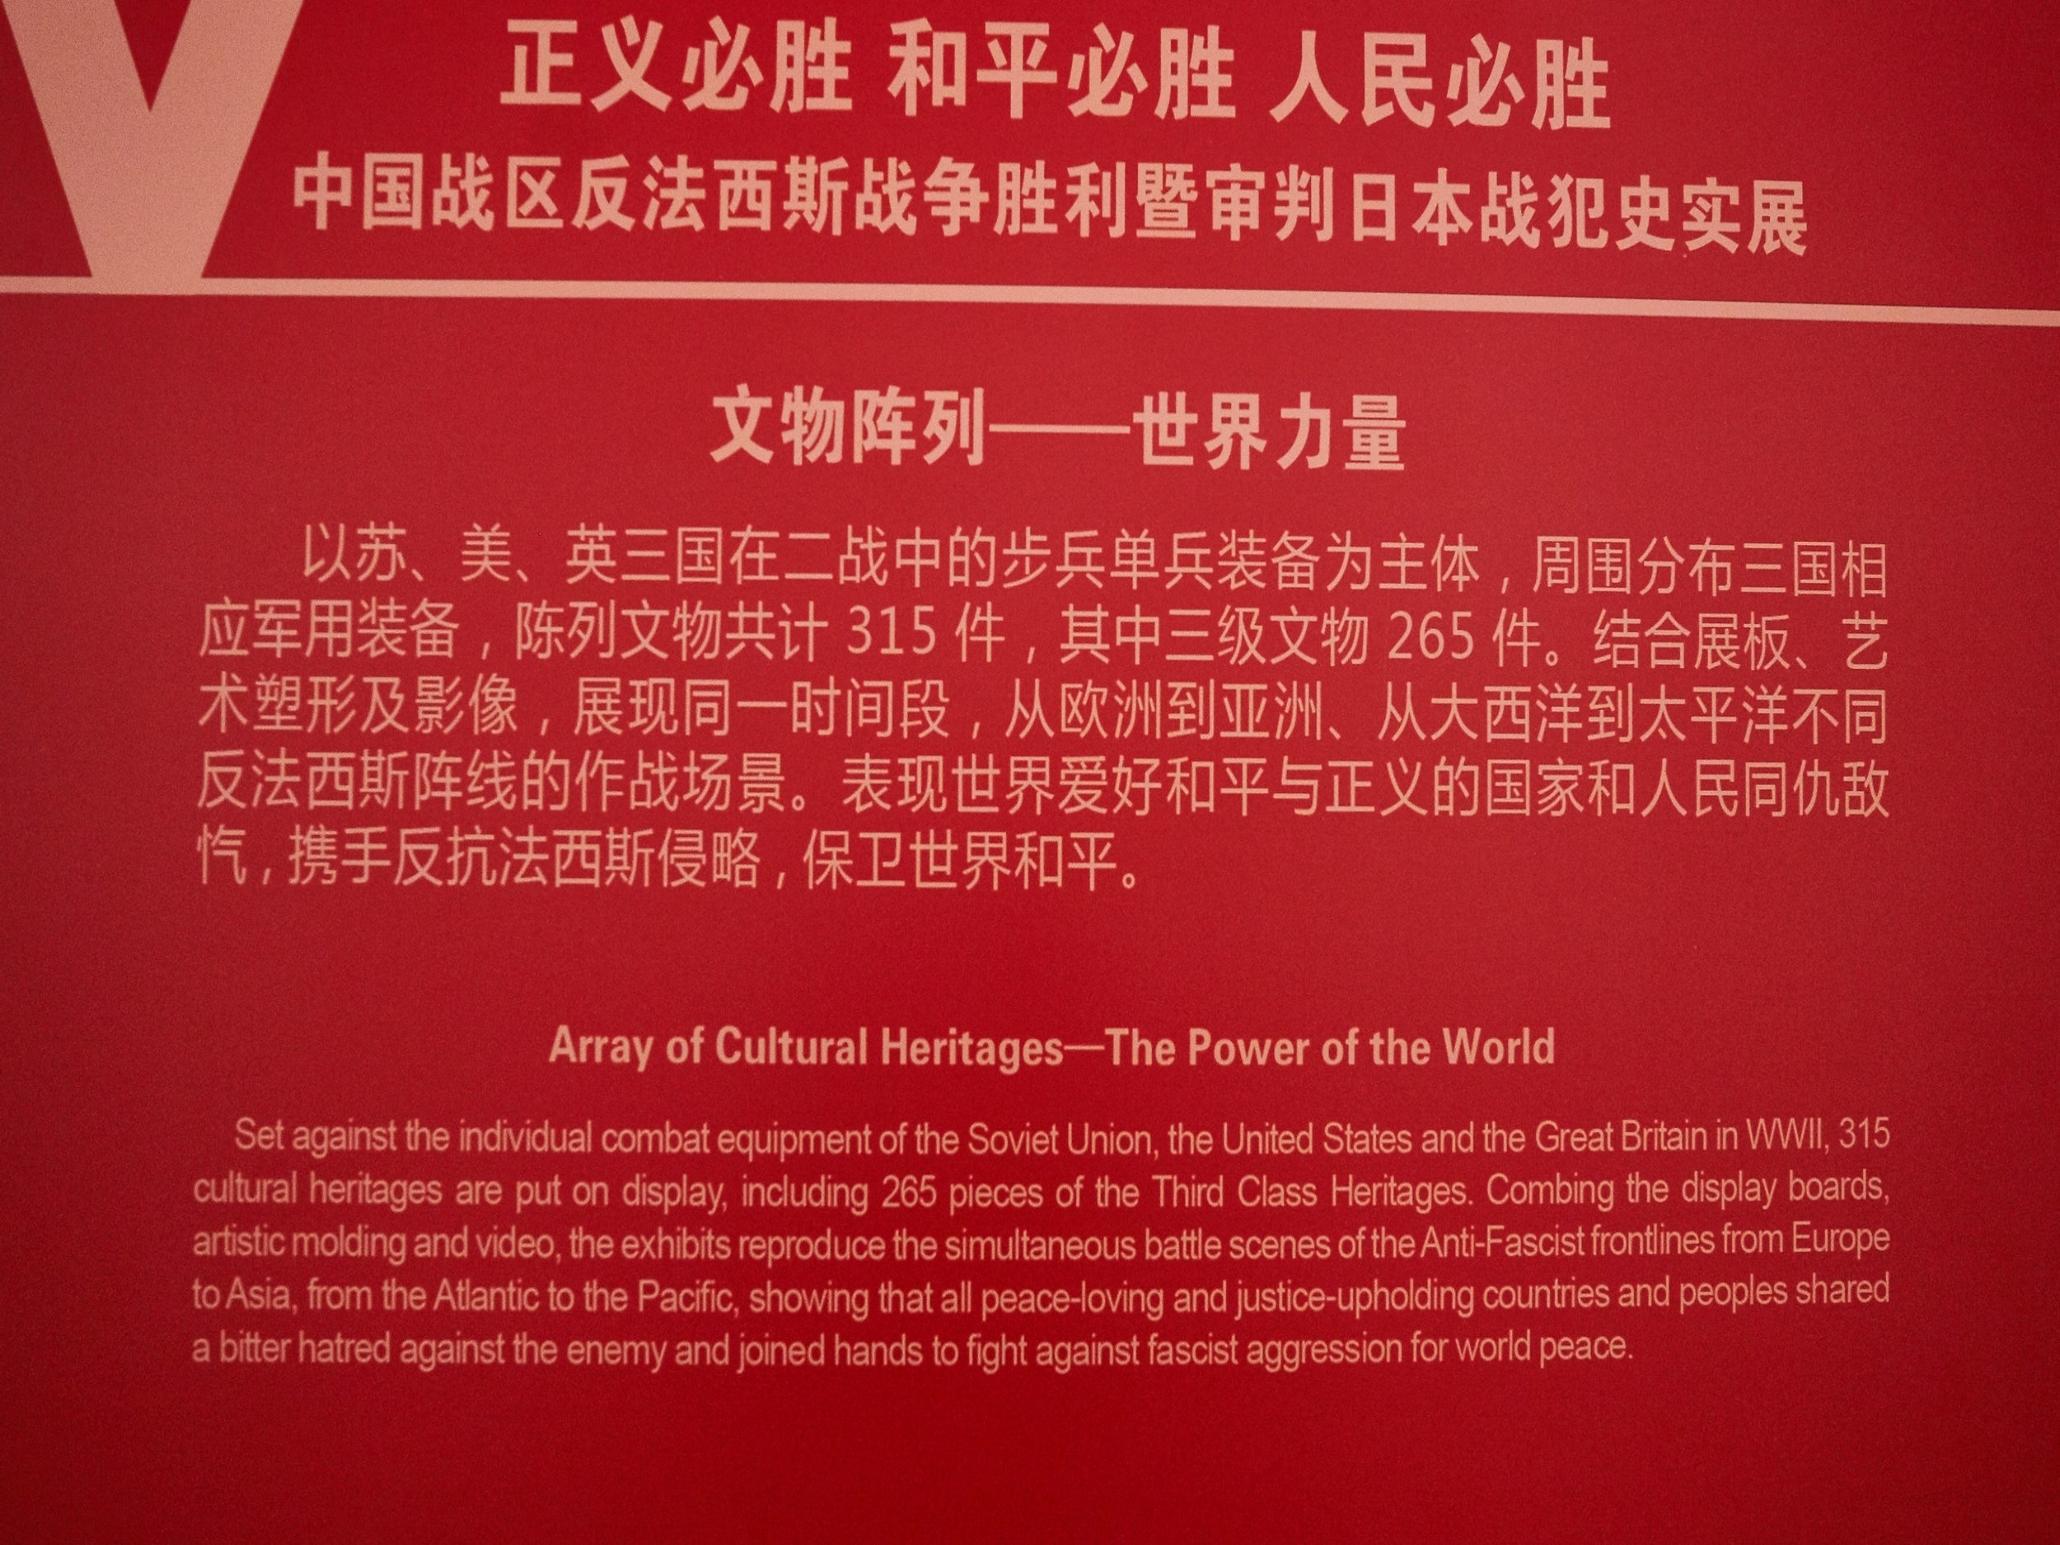 NM cultural heritage power ofworld.jpg